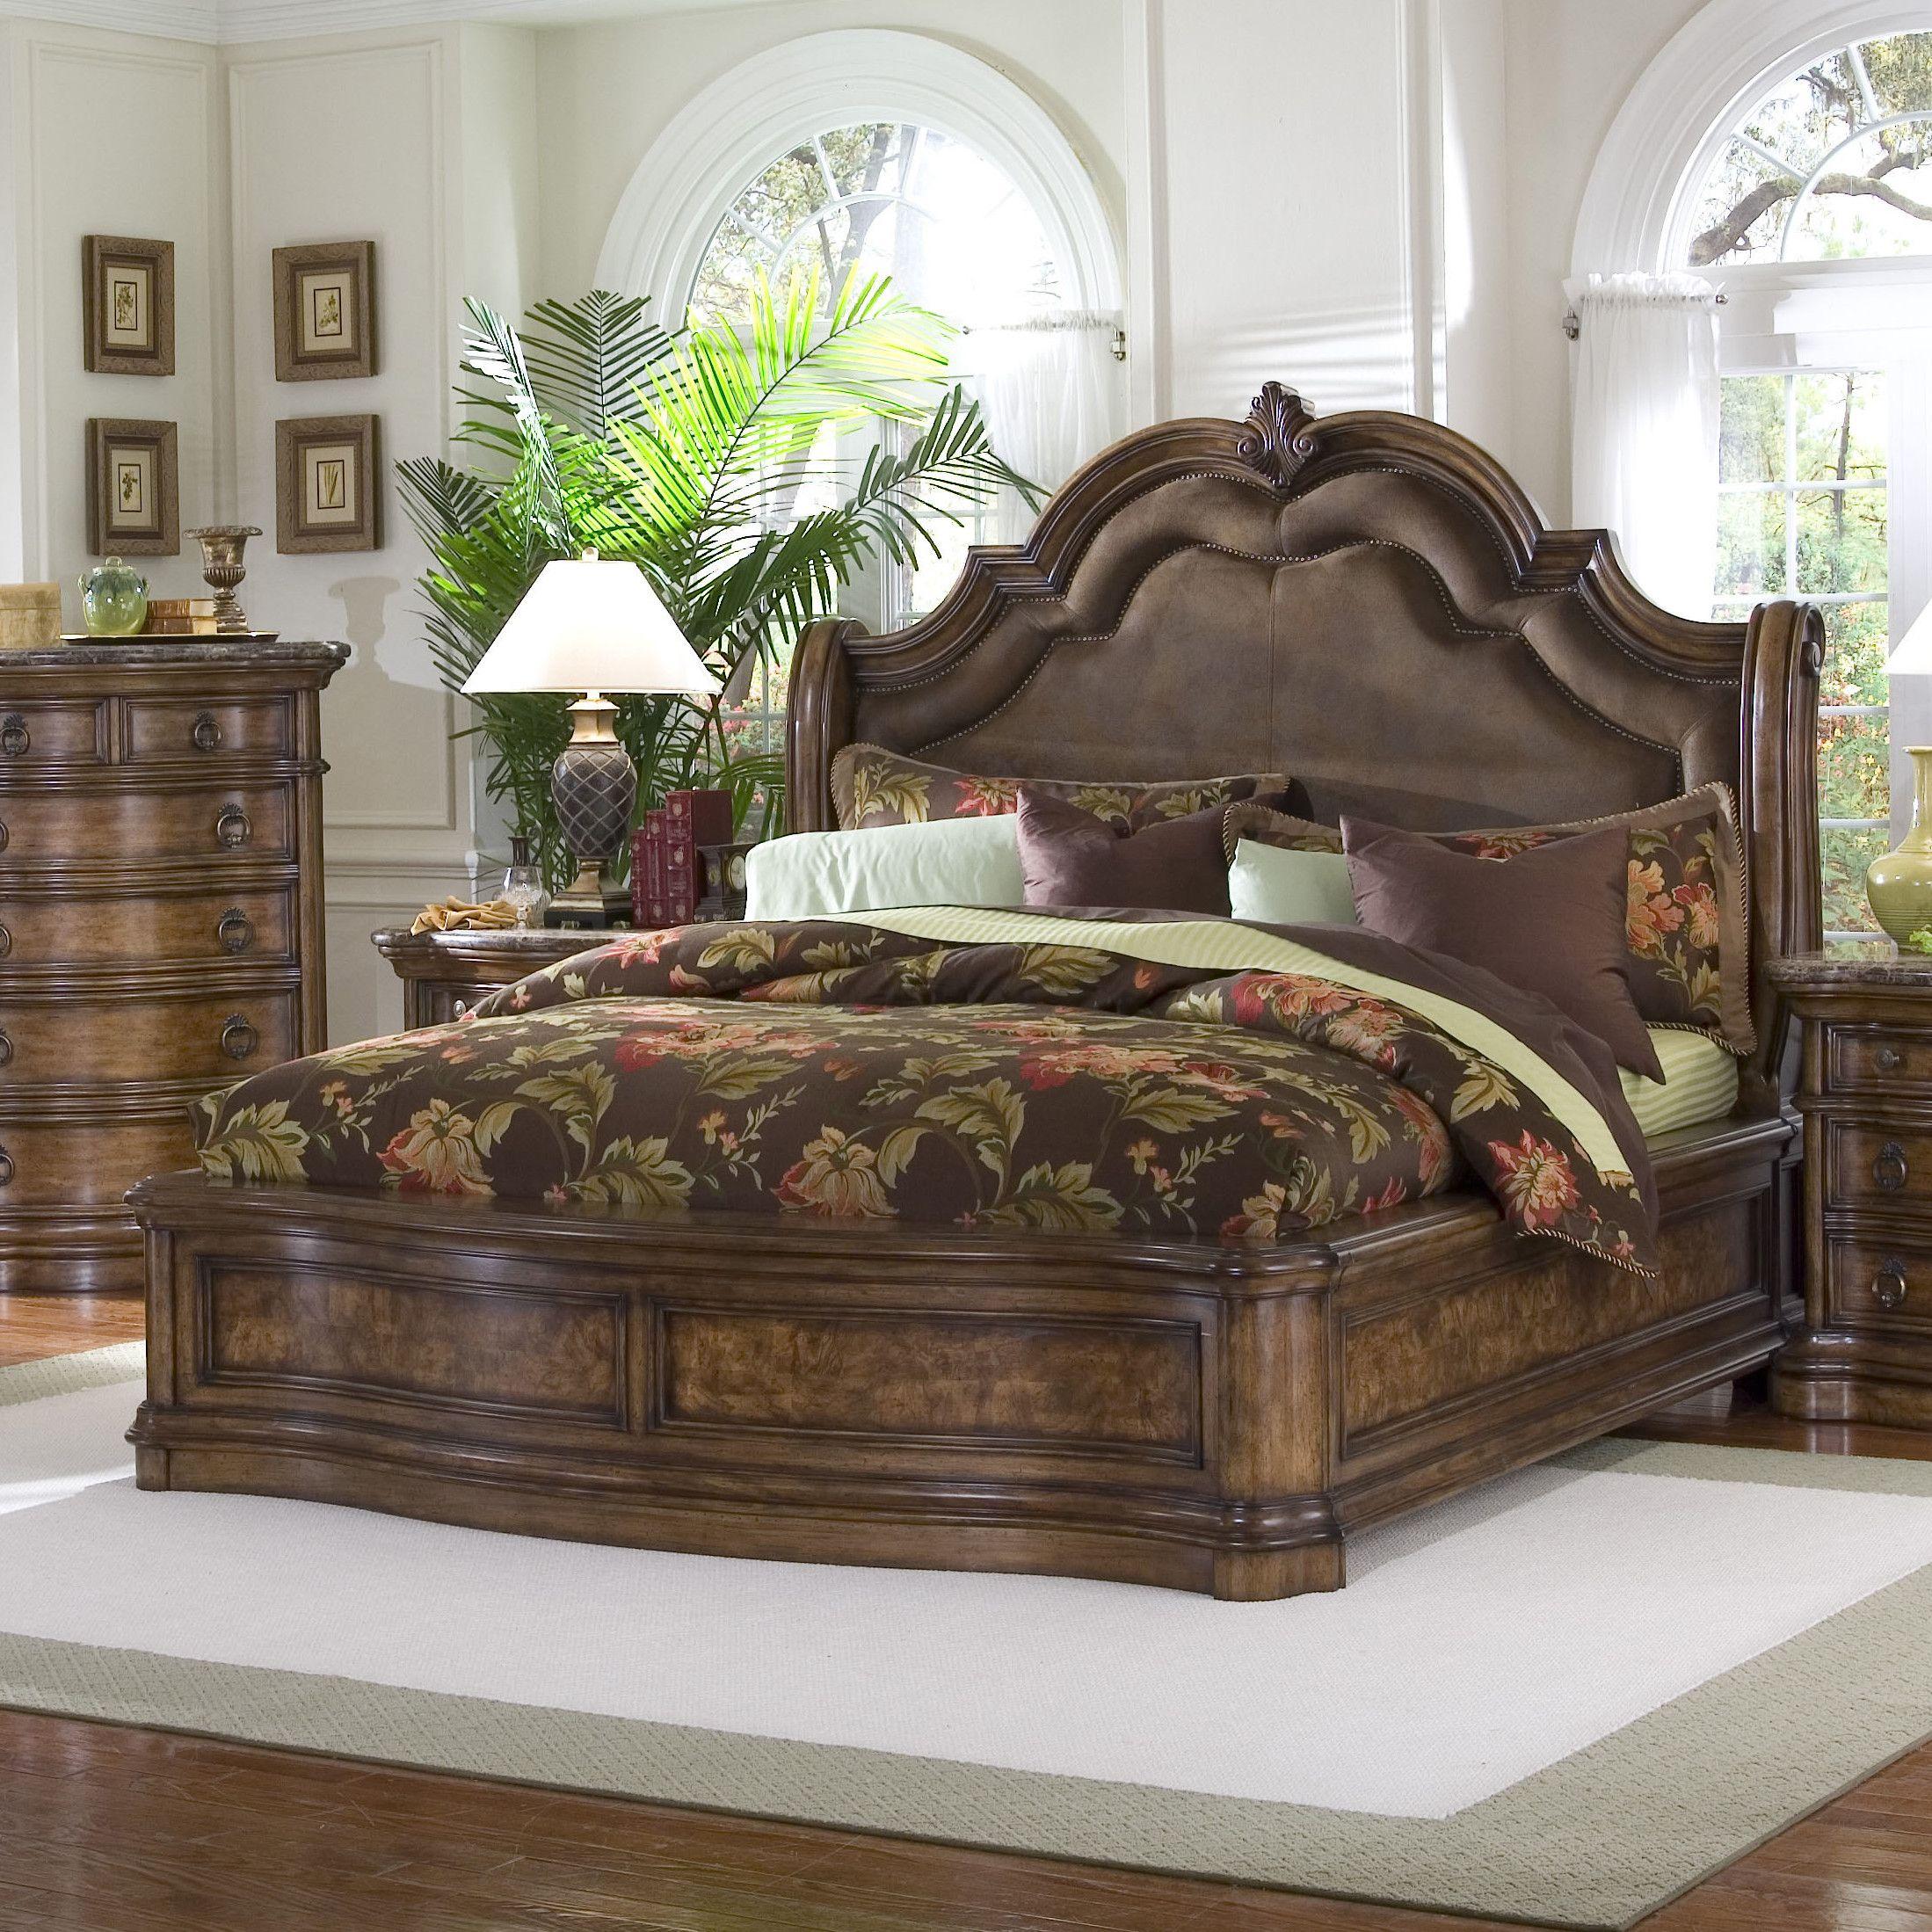 Pulaski Furniture San Mateo Upholstered Panel Bed